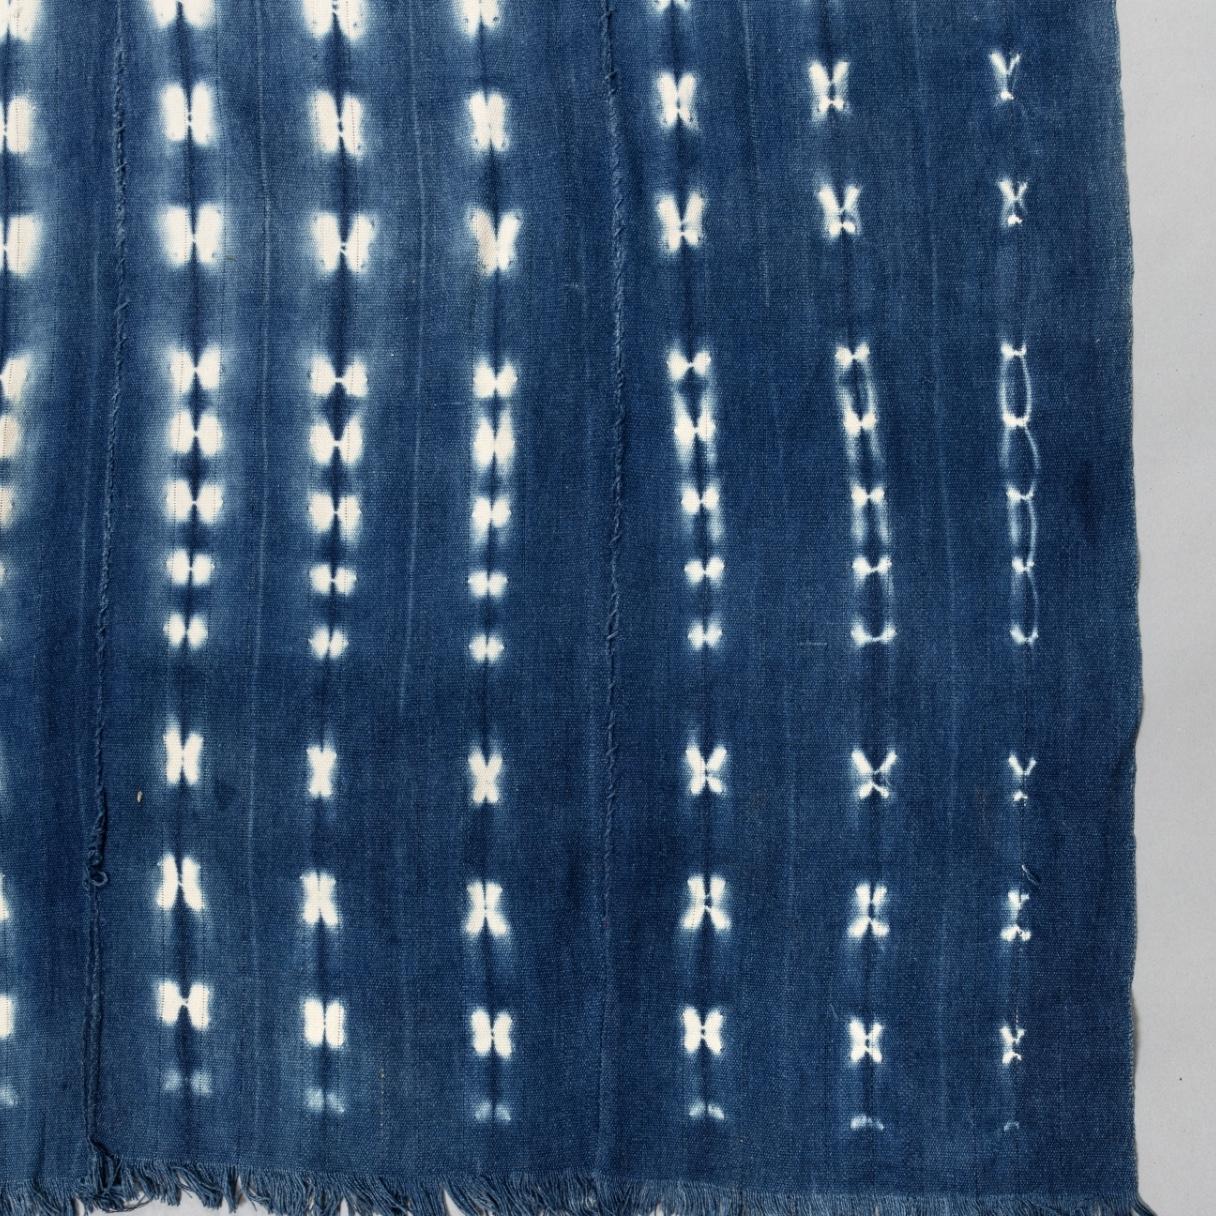 A PEACEFUL CLOTH, MOSSI TRIBE BURKINA FASO ( No 3585 )